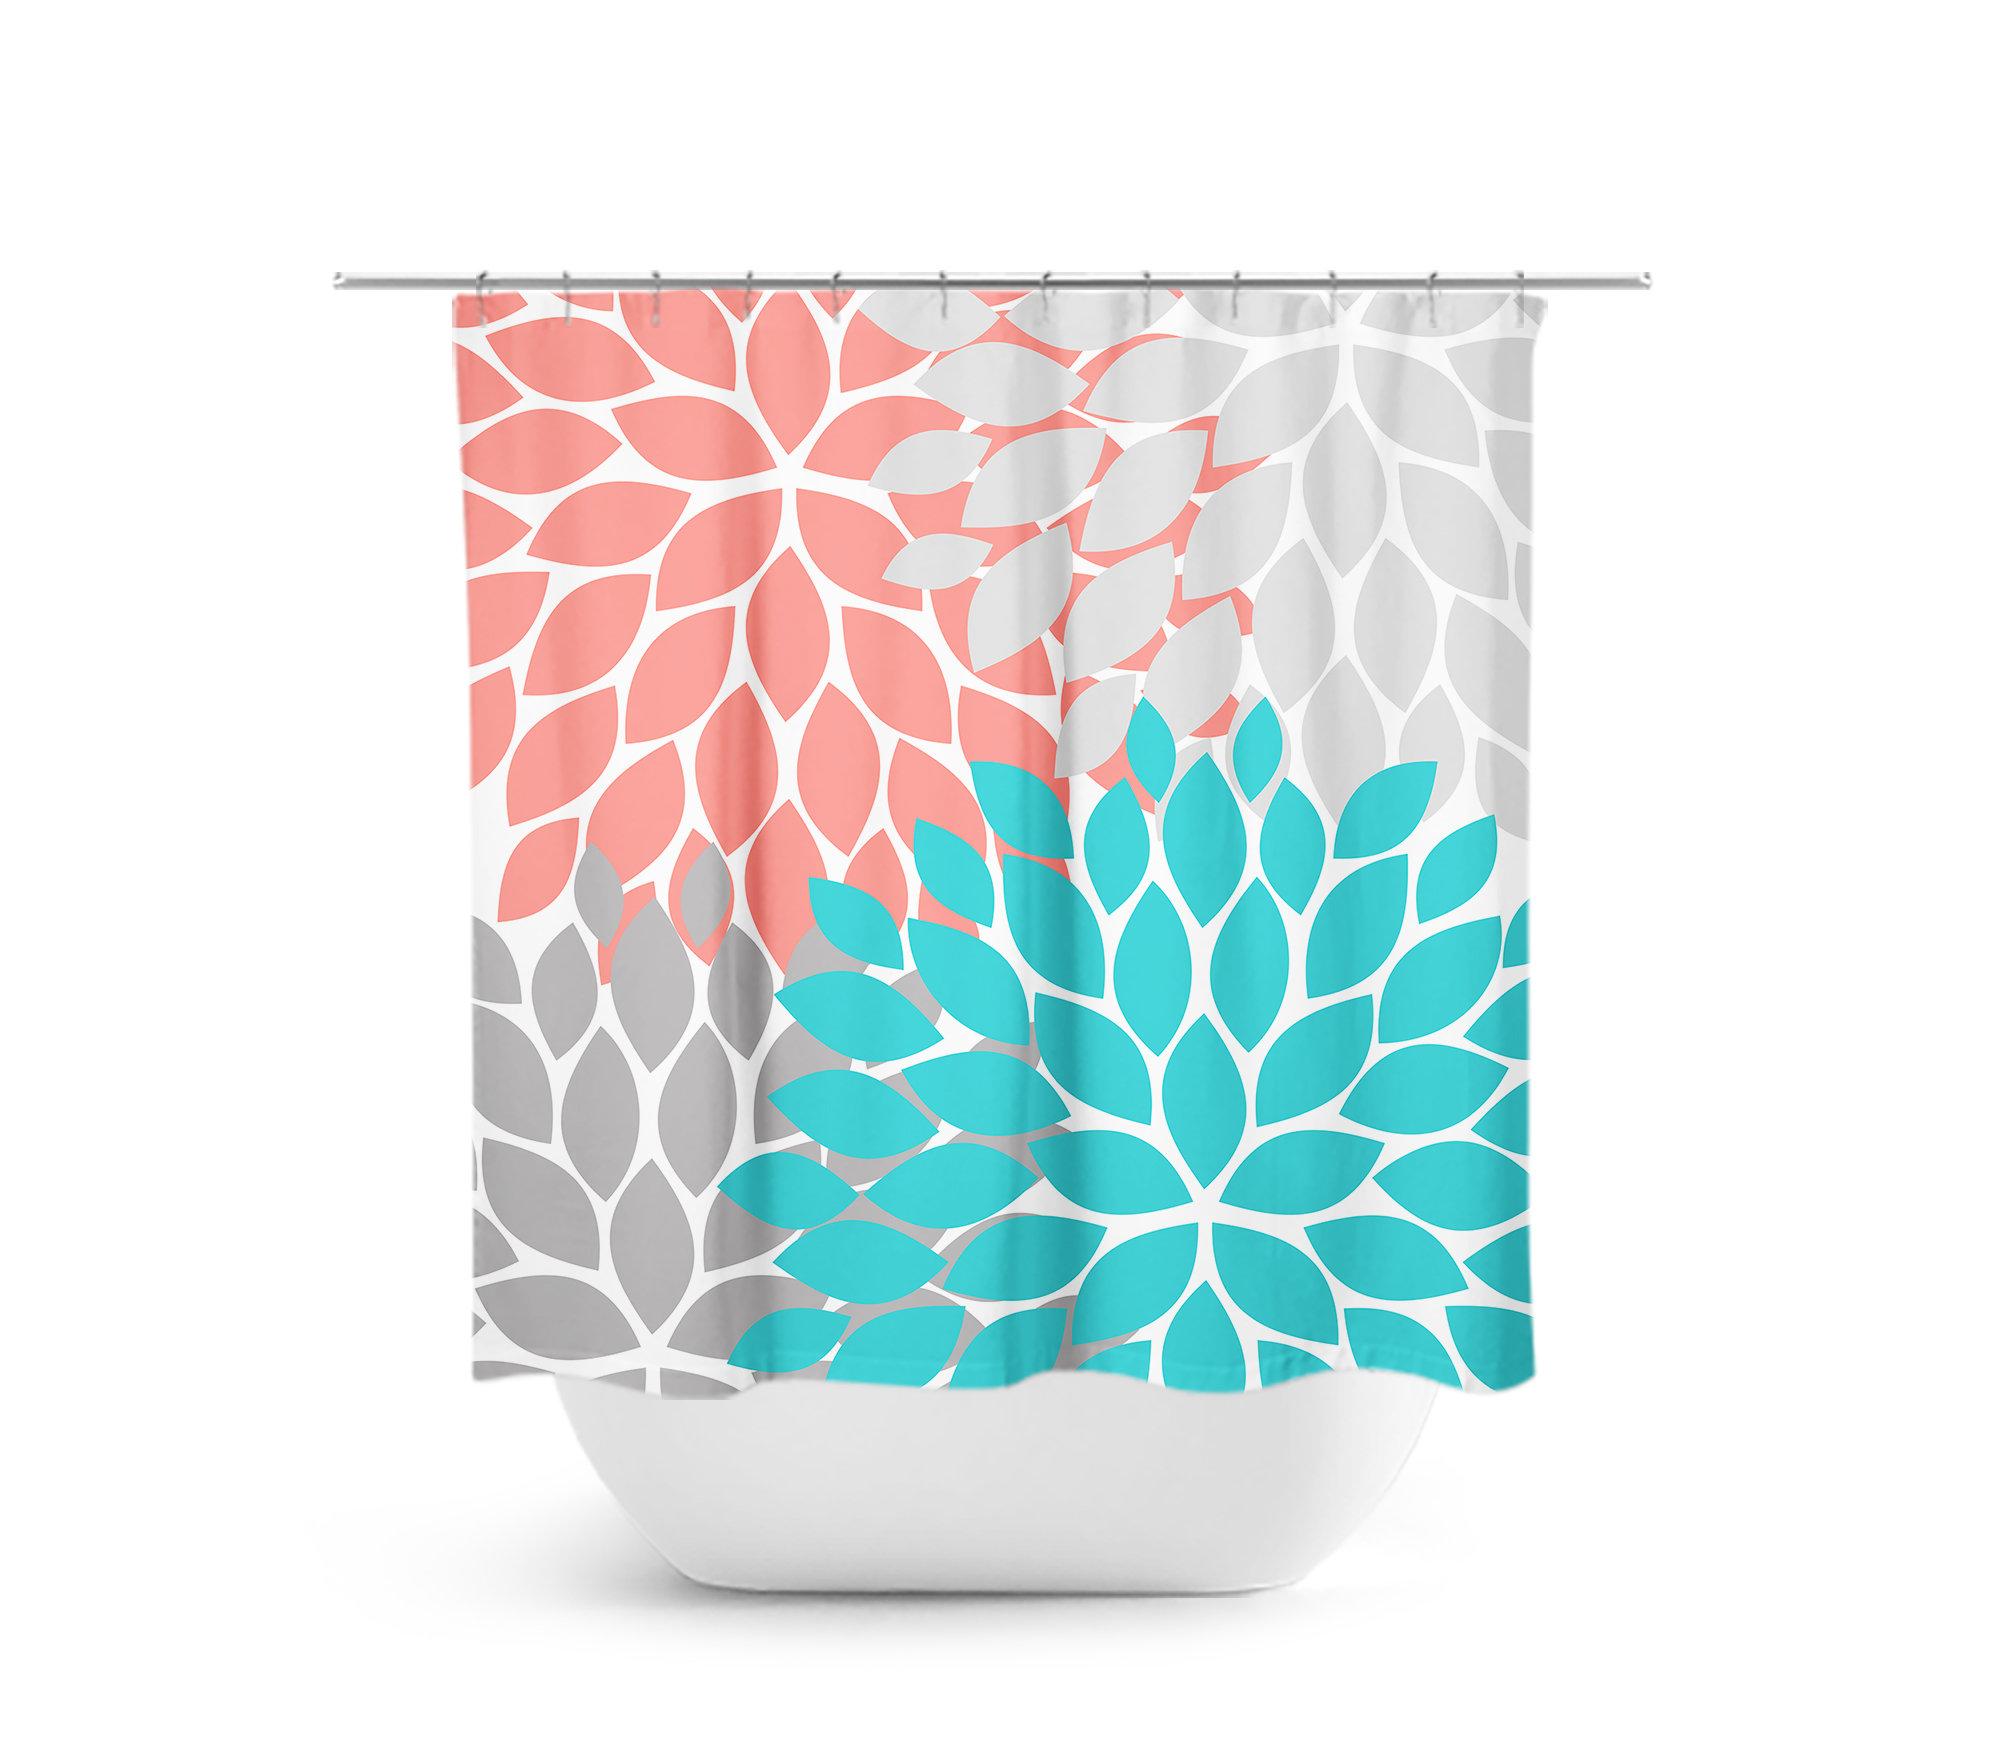 Coral Aqua Gray Shower Curtain Floral Bath Bathroom Decor Guest Bathtub